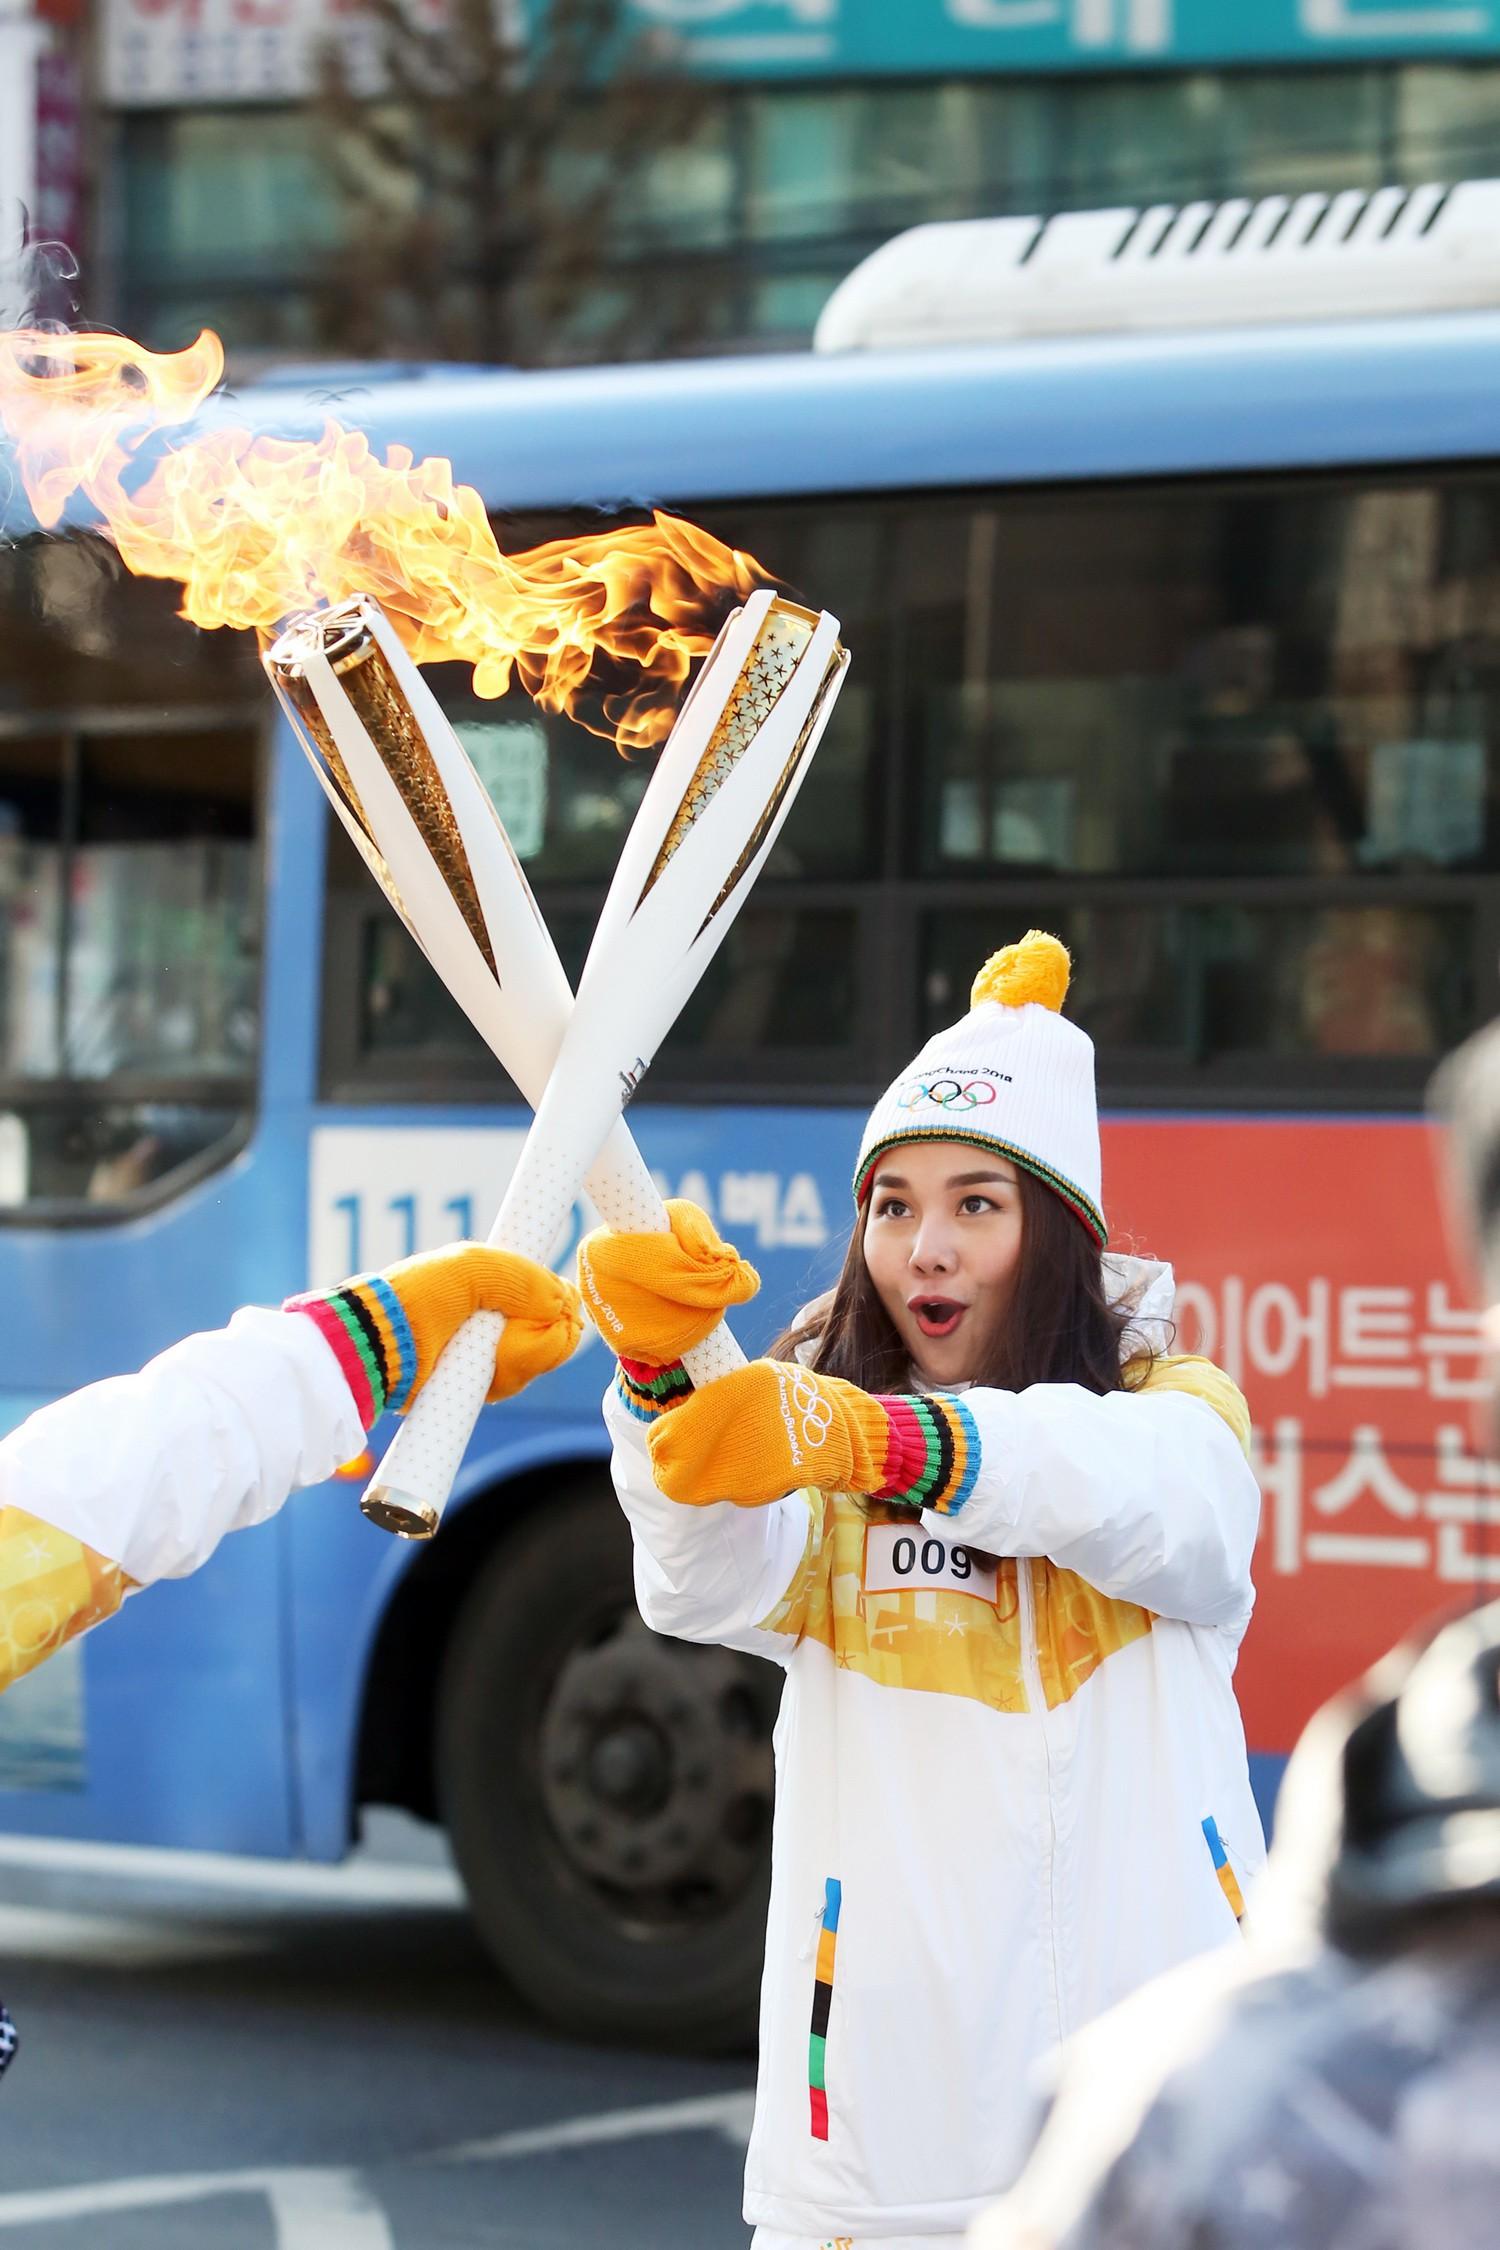 thanh-hang-seoul-4-1515682087500.jpg